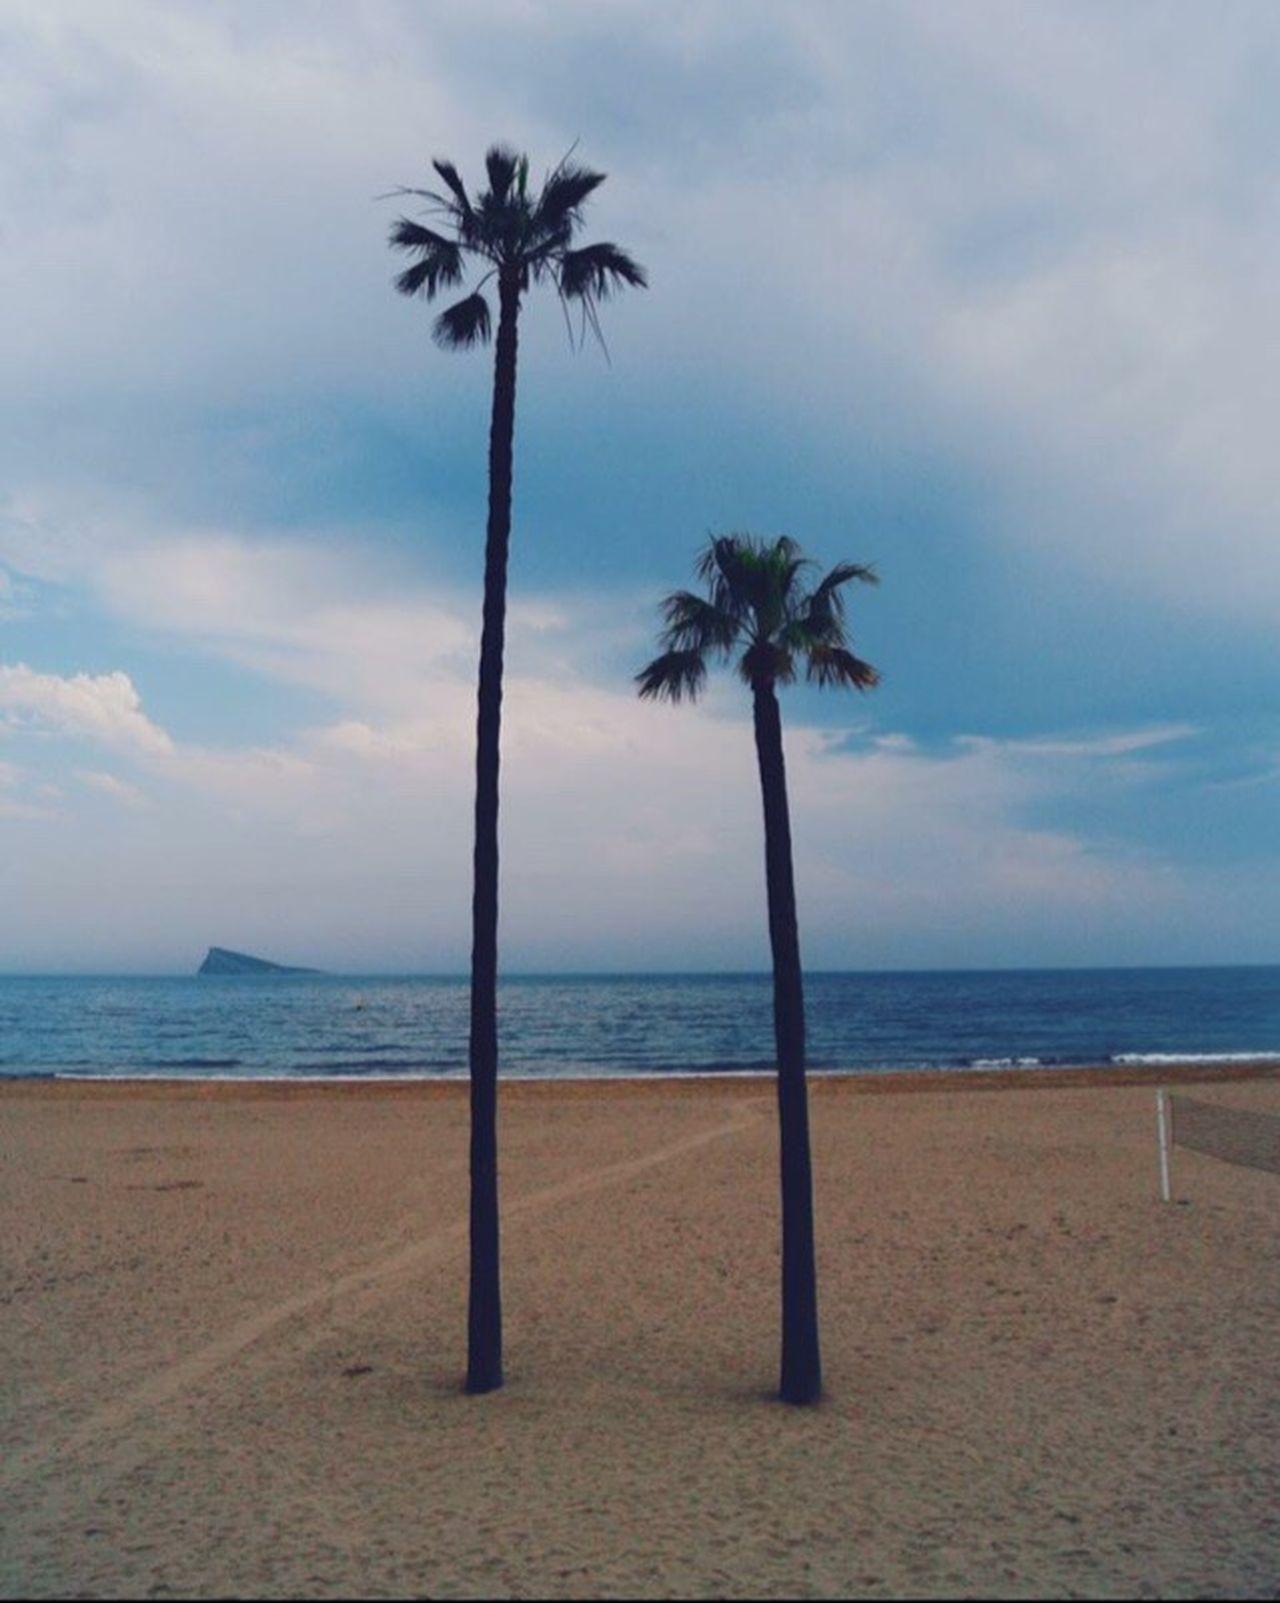 Beach Sea Palm Tree Sky Horizon Over Water Sand Water Nature Beauty In Nature